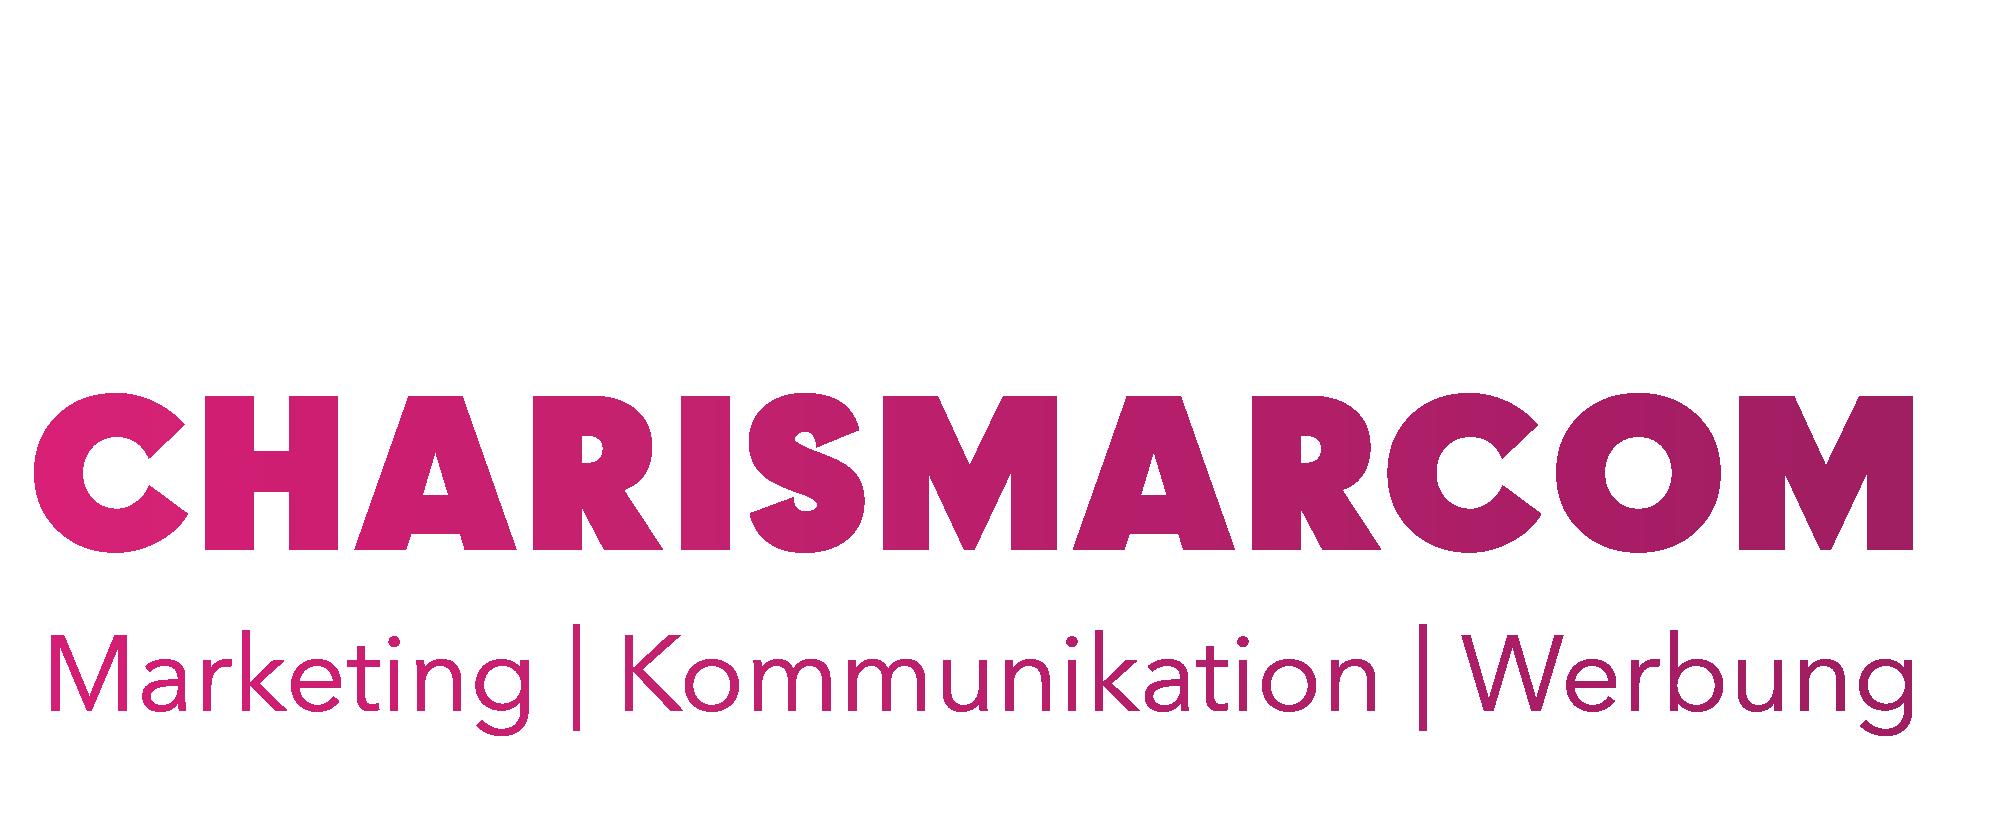 Charismarcom_Logo_tagline